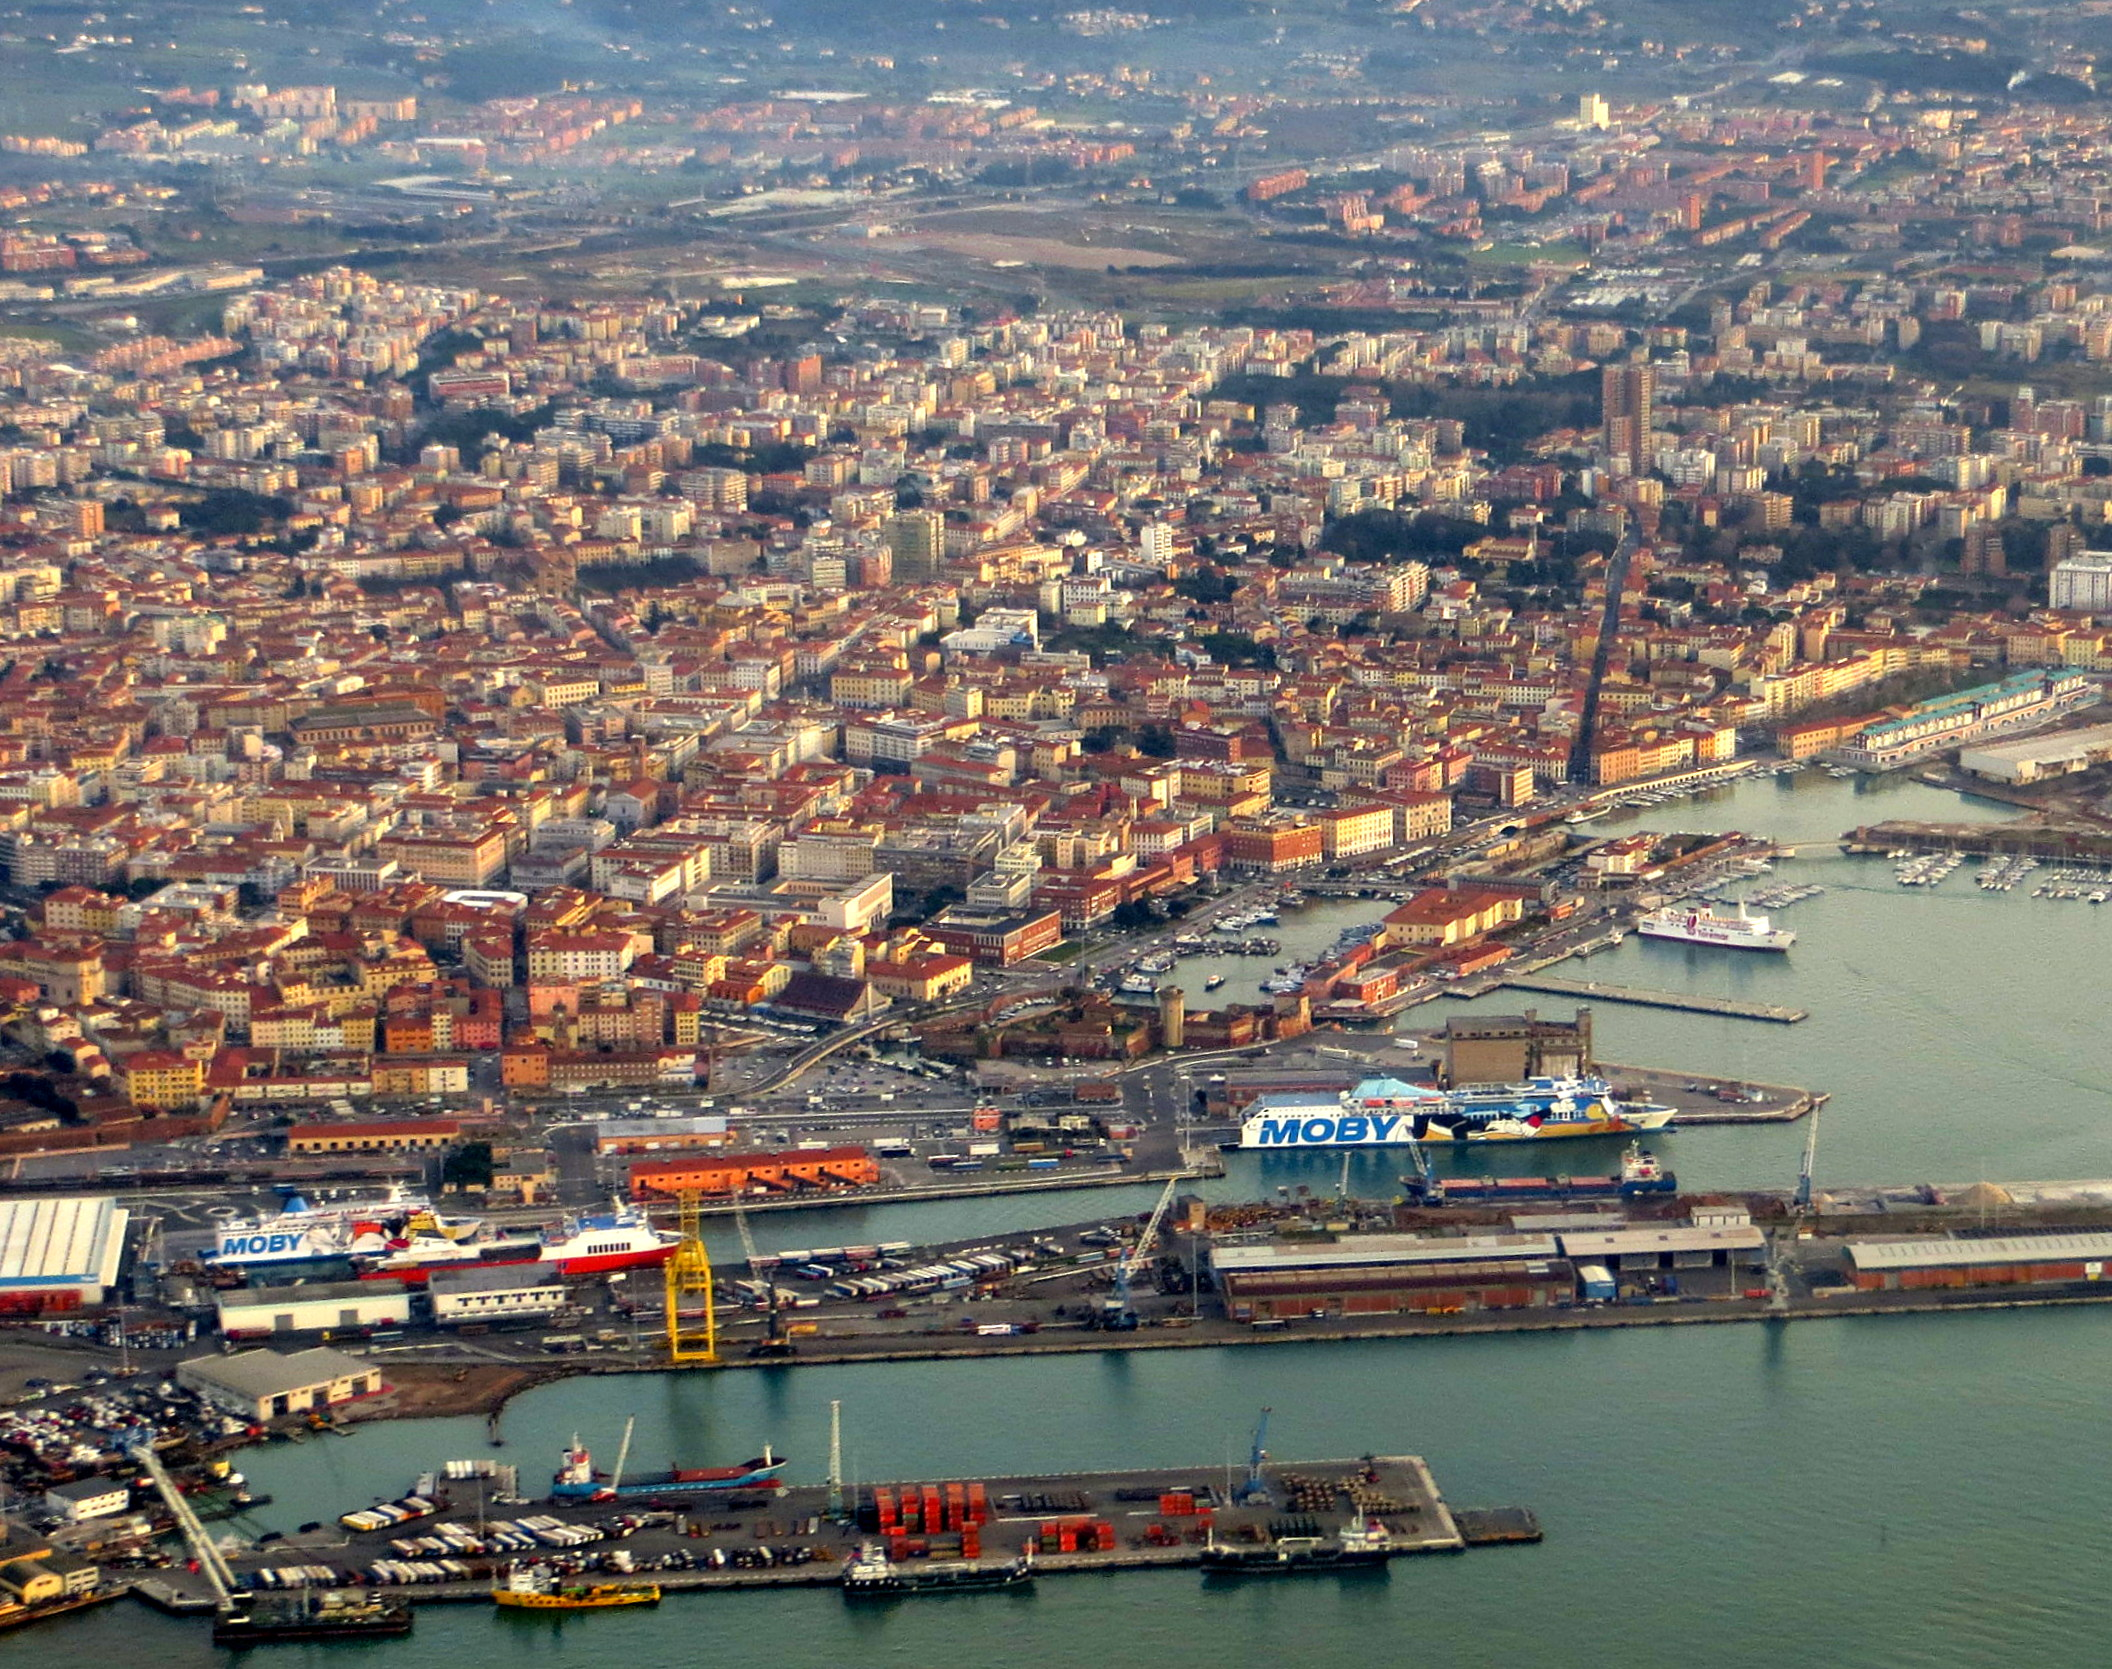 File:Livorno dall'aereo 1.JPG - Wikimedia Commons